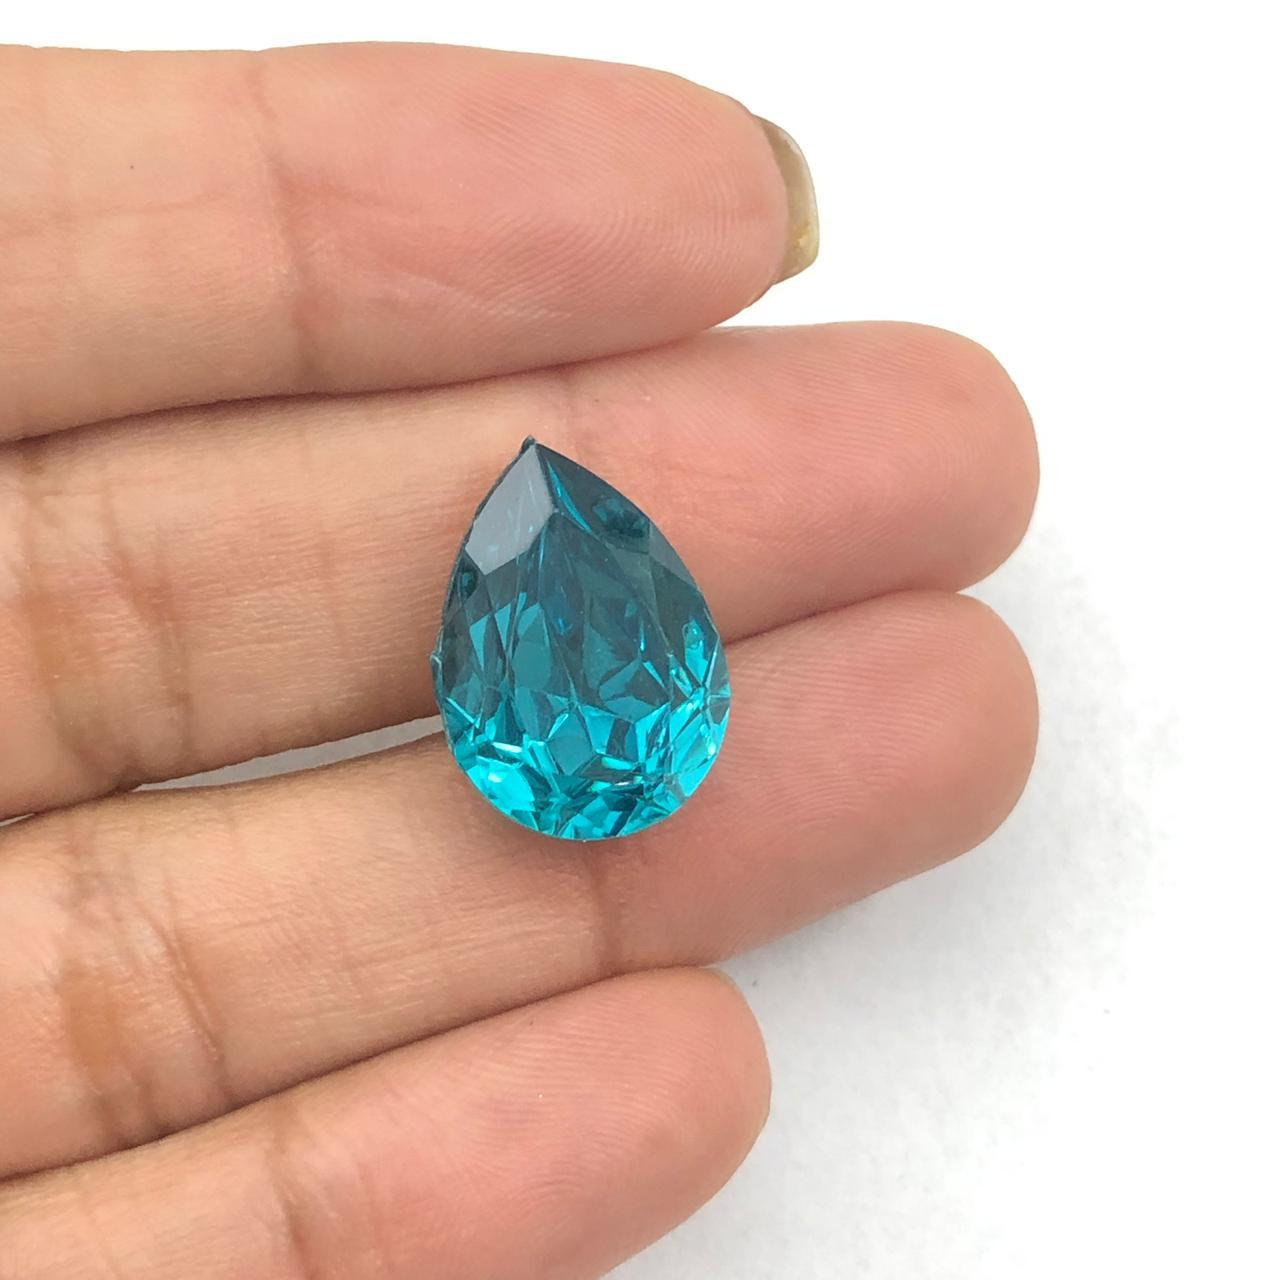 CHT1360 - Chaton Gota 13x18 Base Côncava Blue Zircon - 2unids